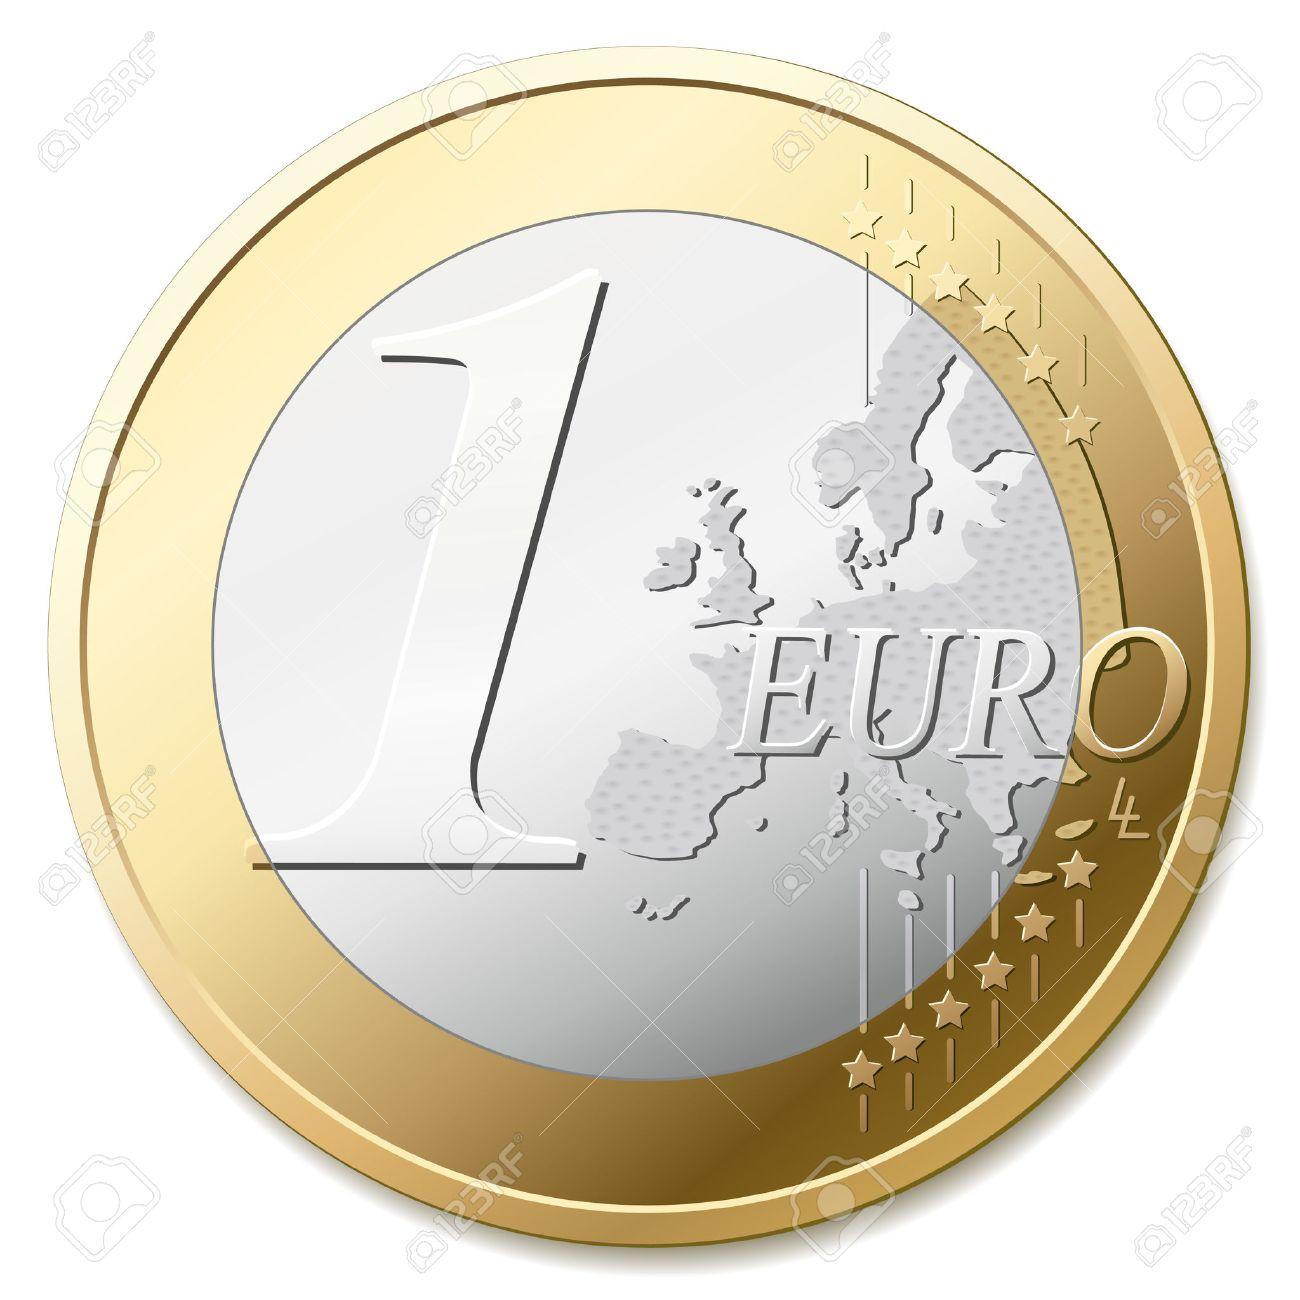 One euro coin vector illustration - 2687565